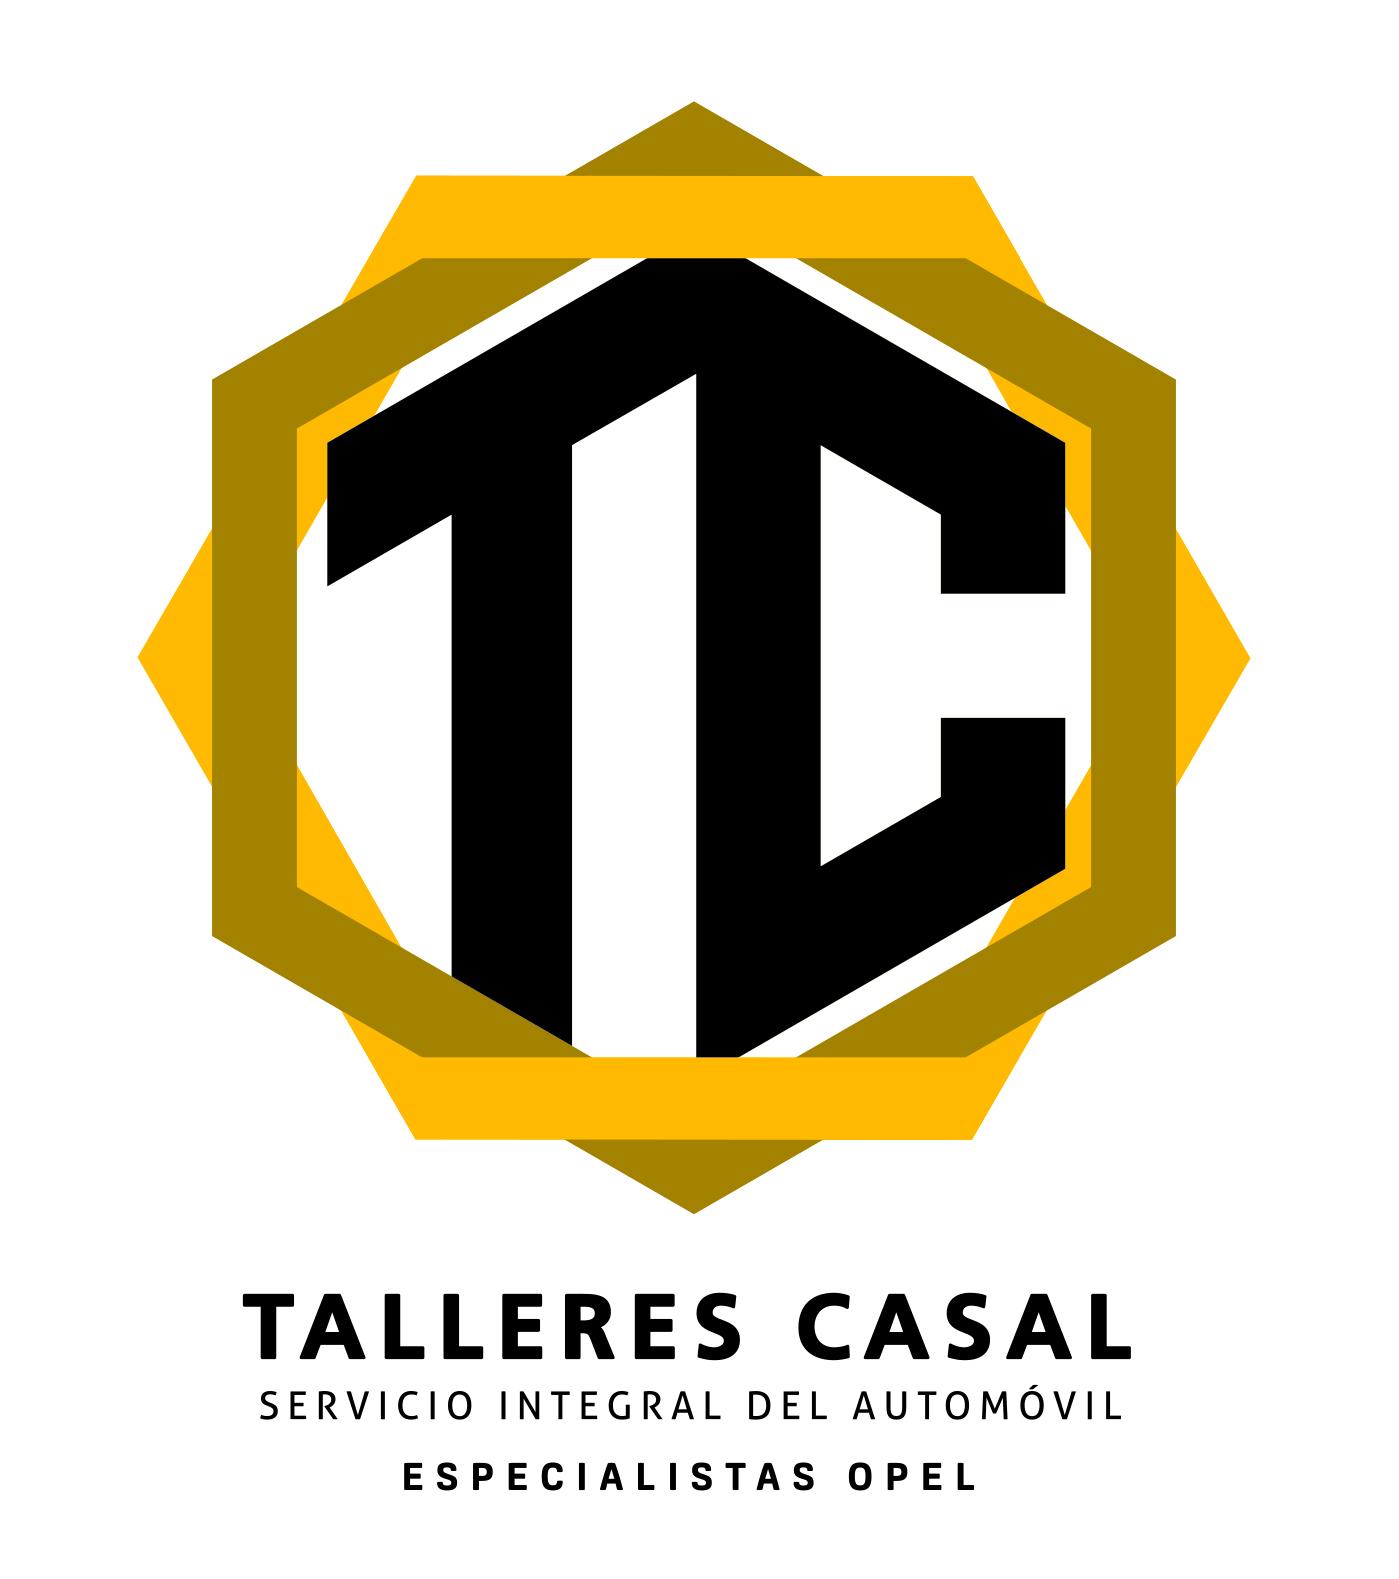 Talleres Casal